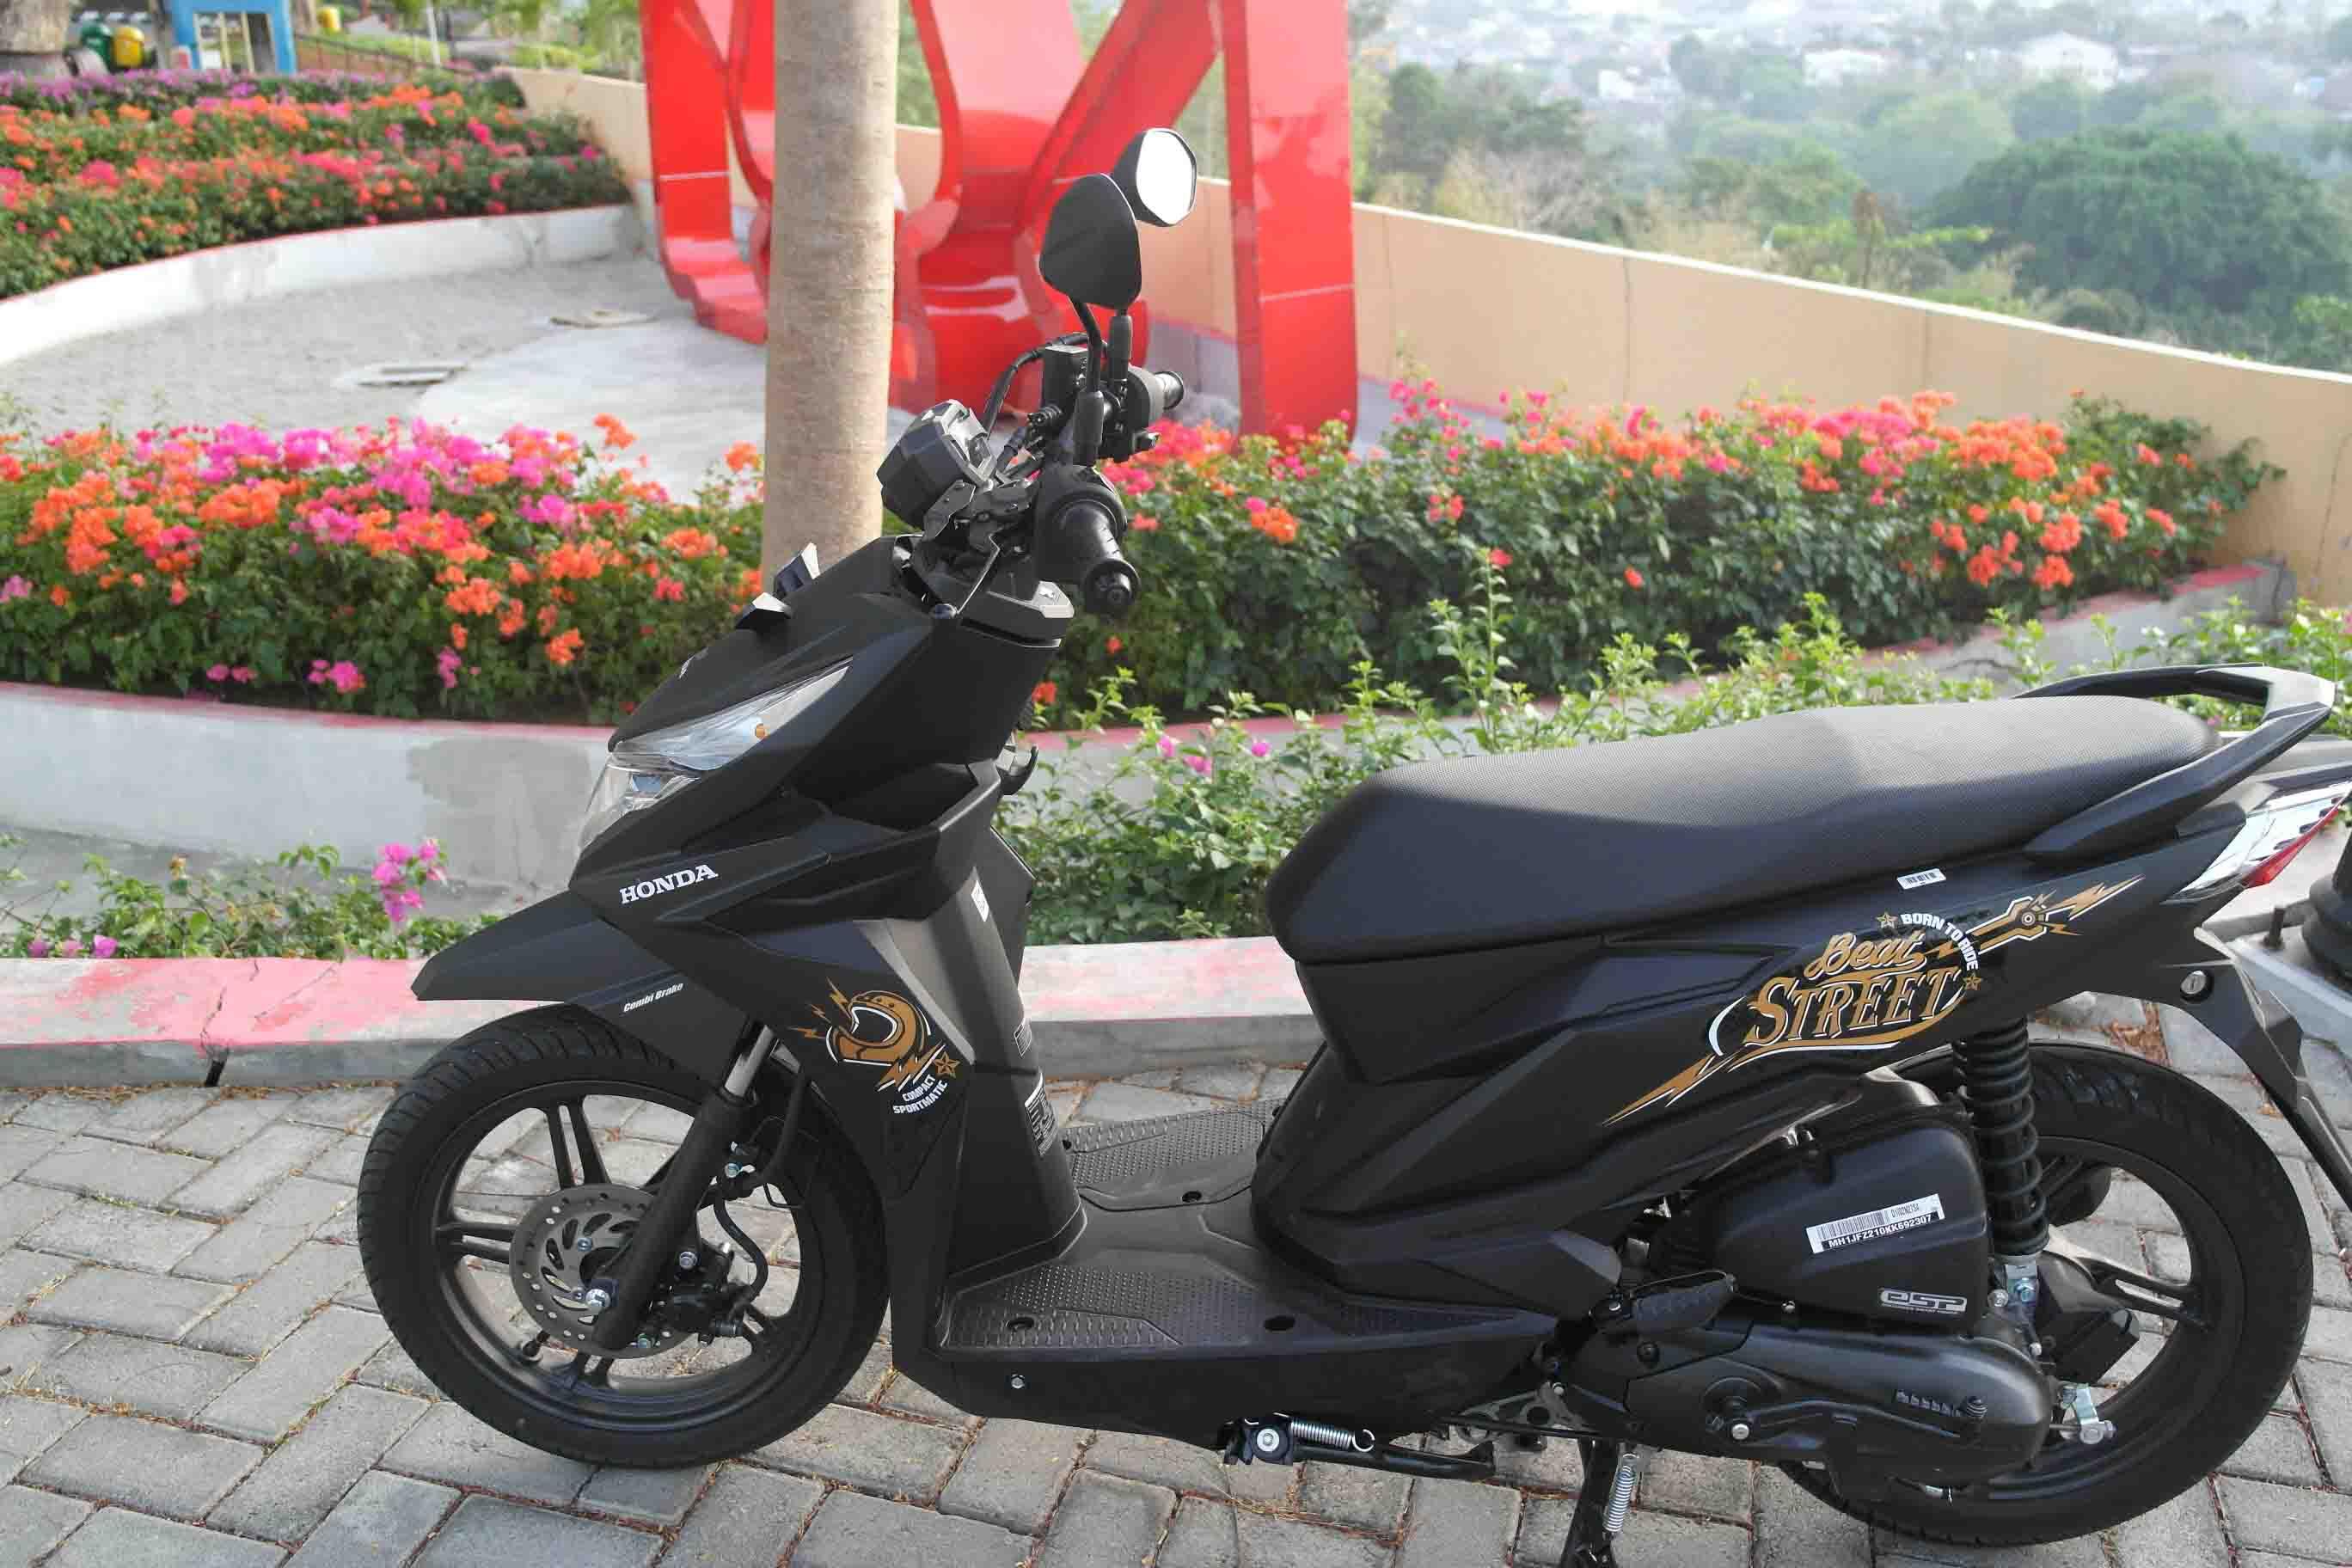 Inilah Harga Service Motor Honda Terbaru 2020 di Astra Motor Center Semarang